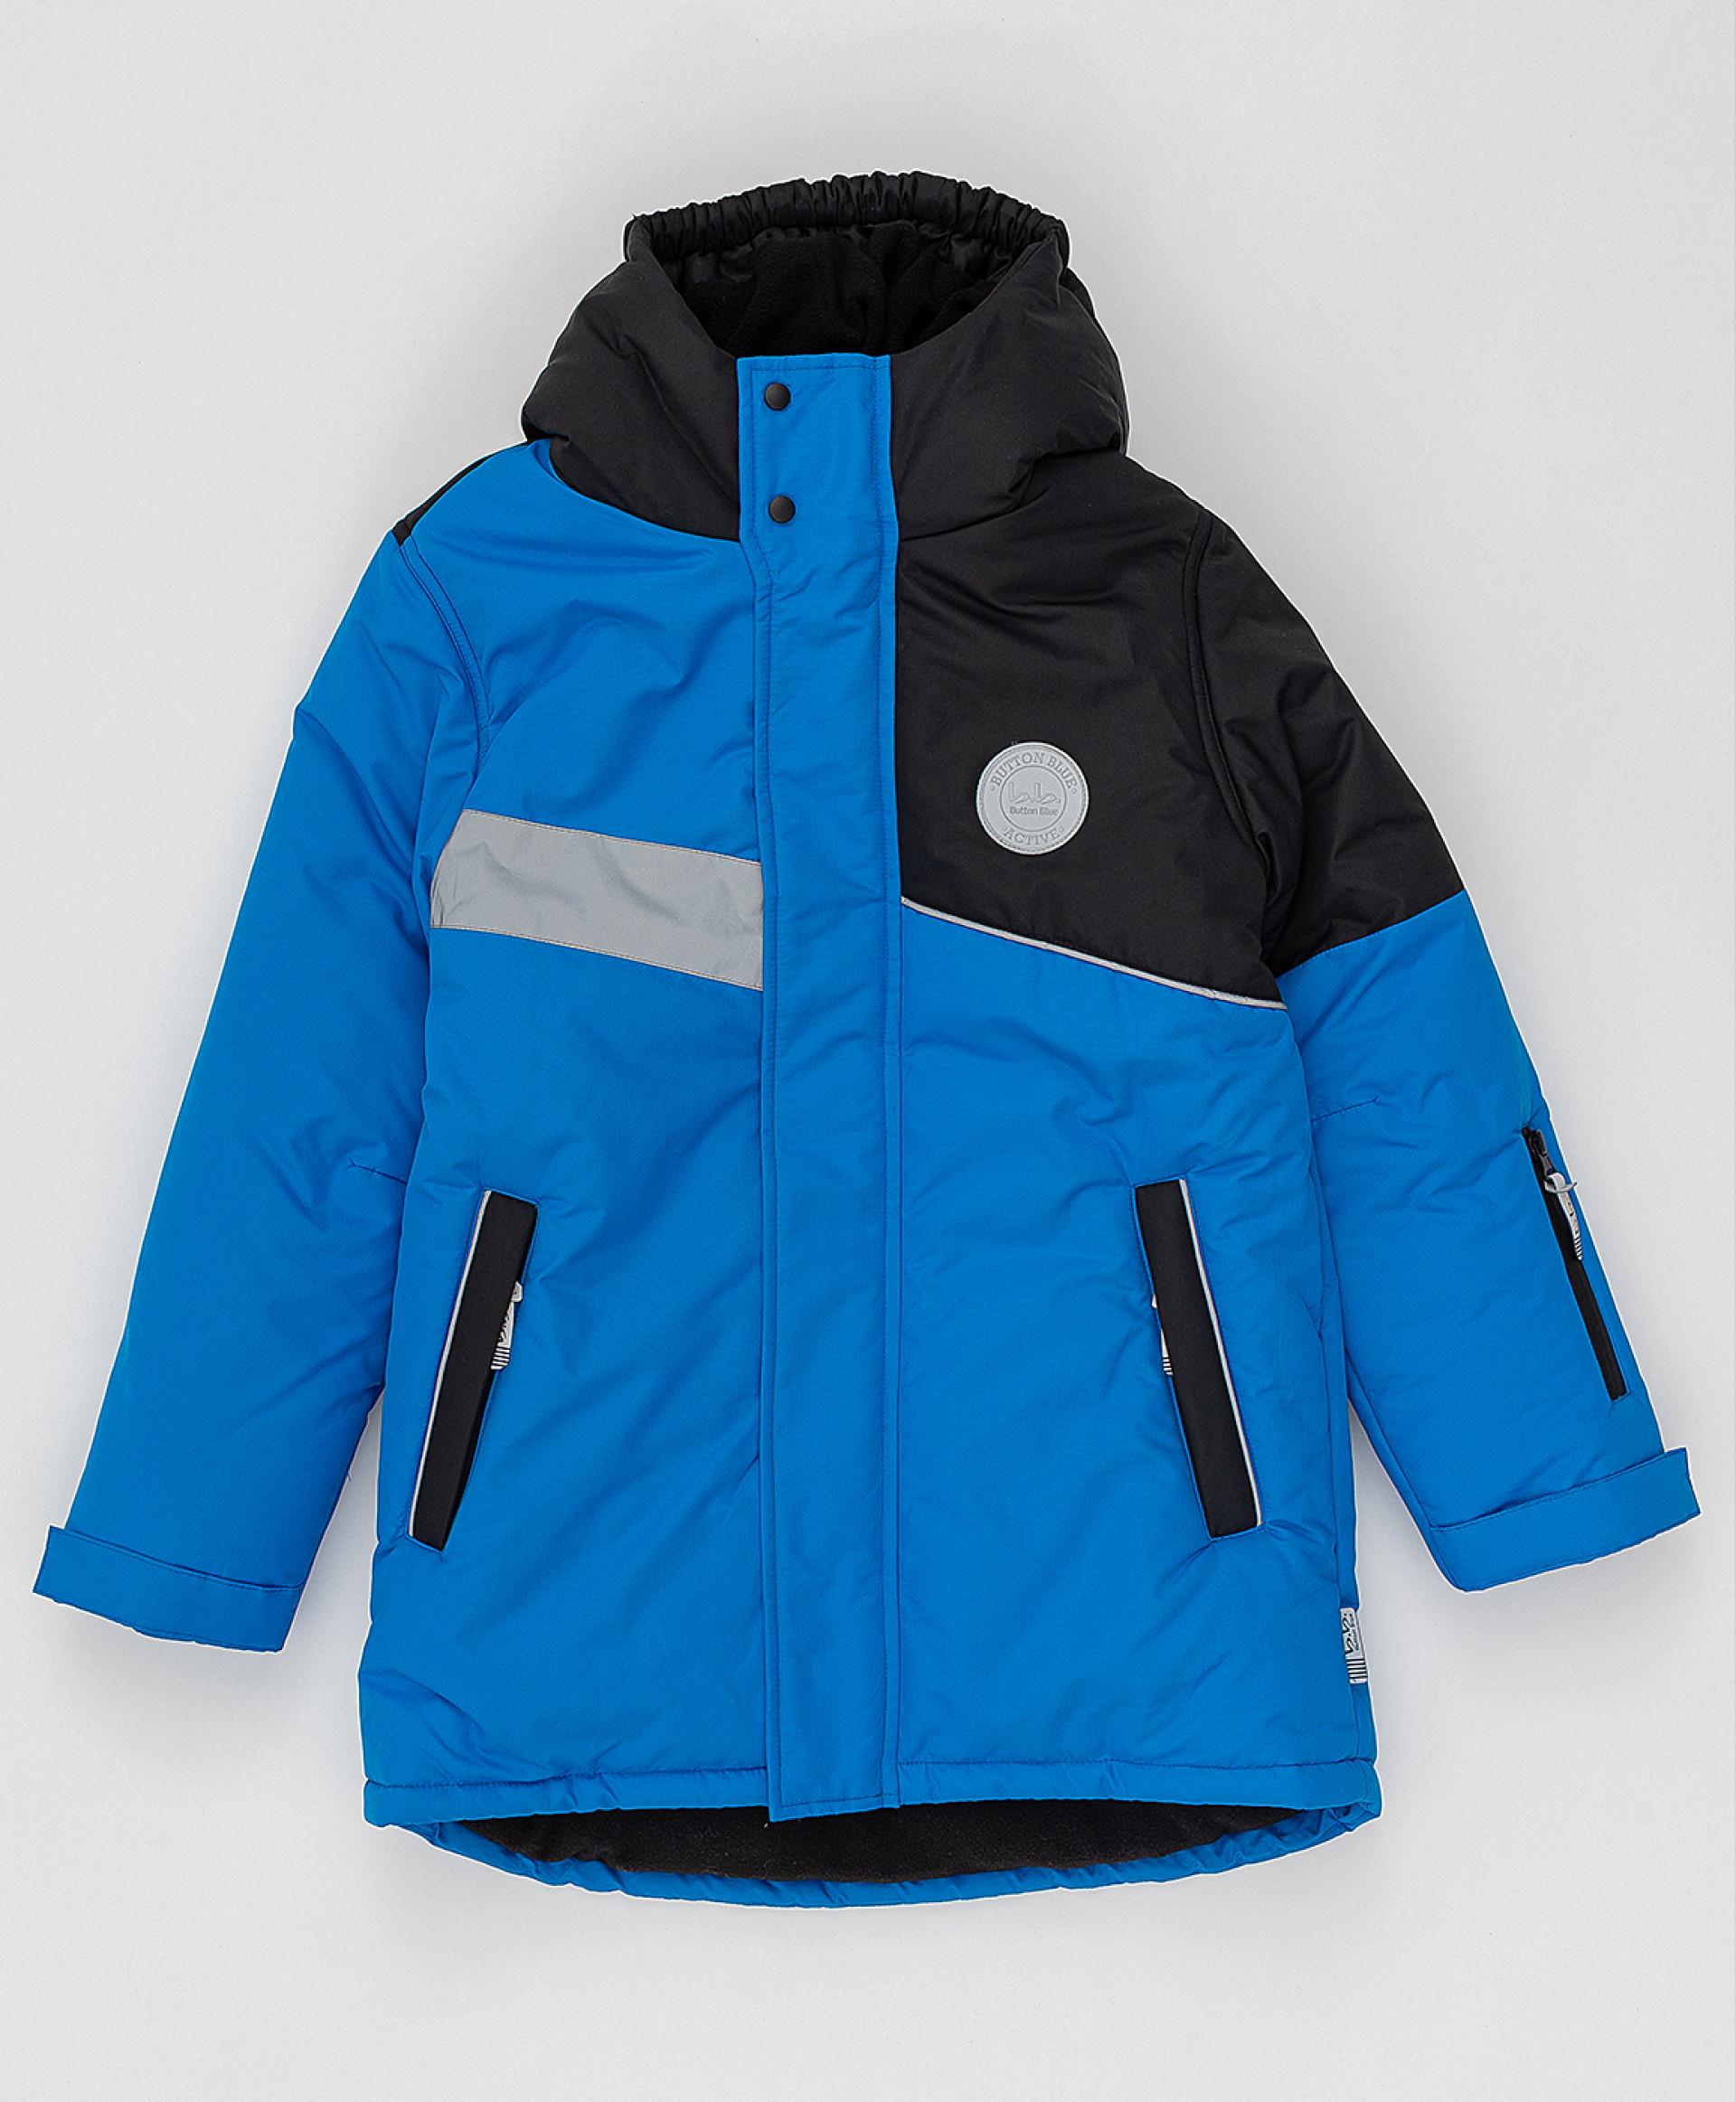 Зимнее пальто Active Button Blue 220BBBA45013700, размер